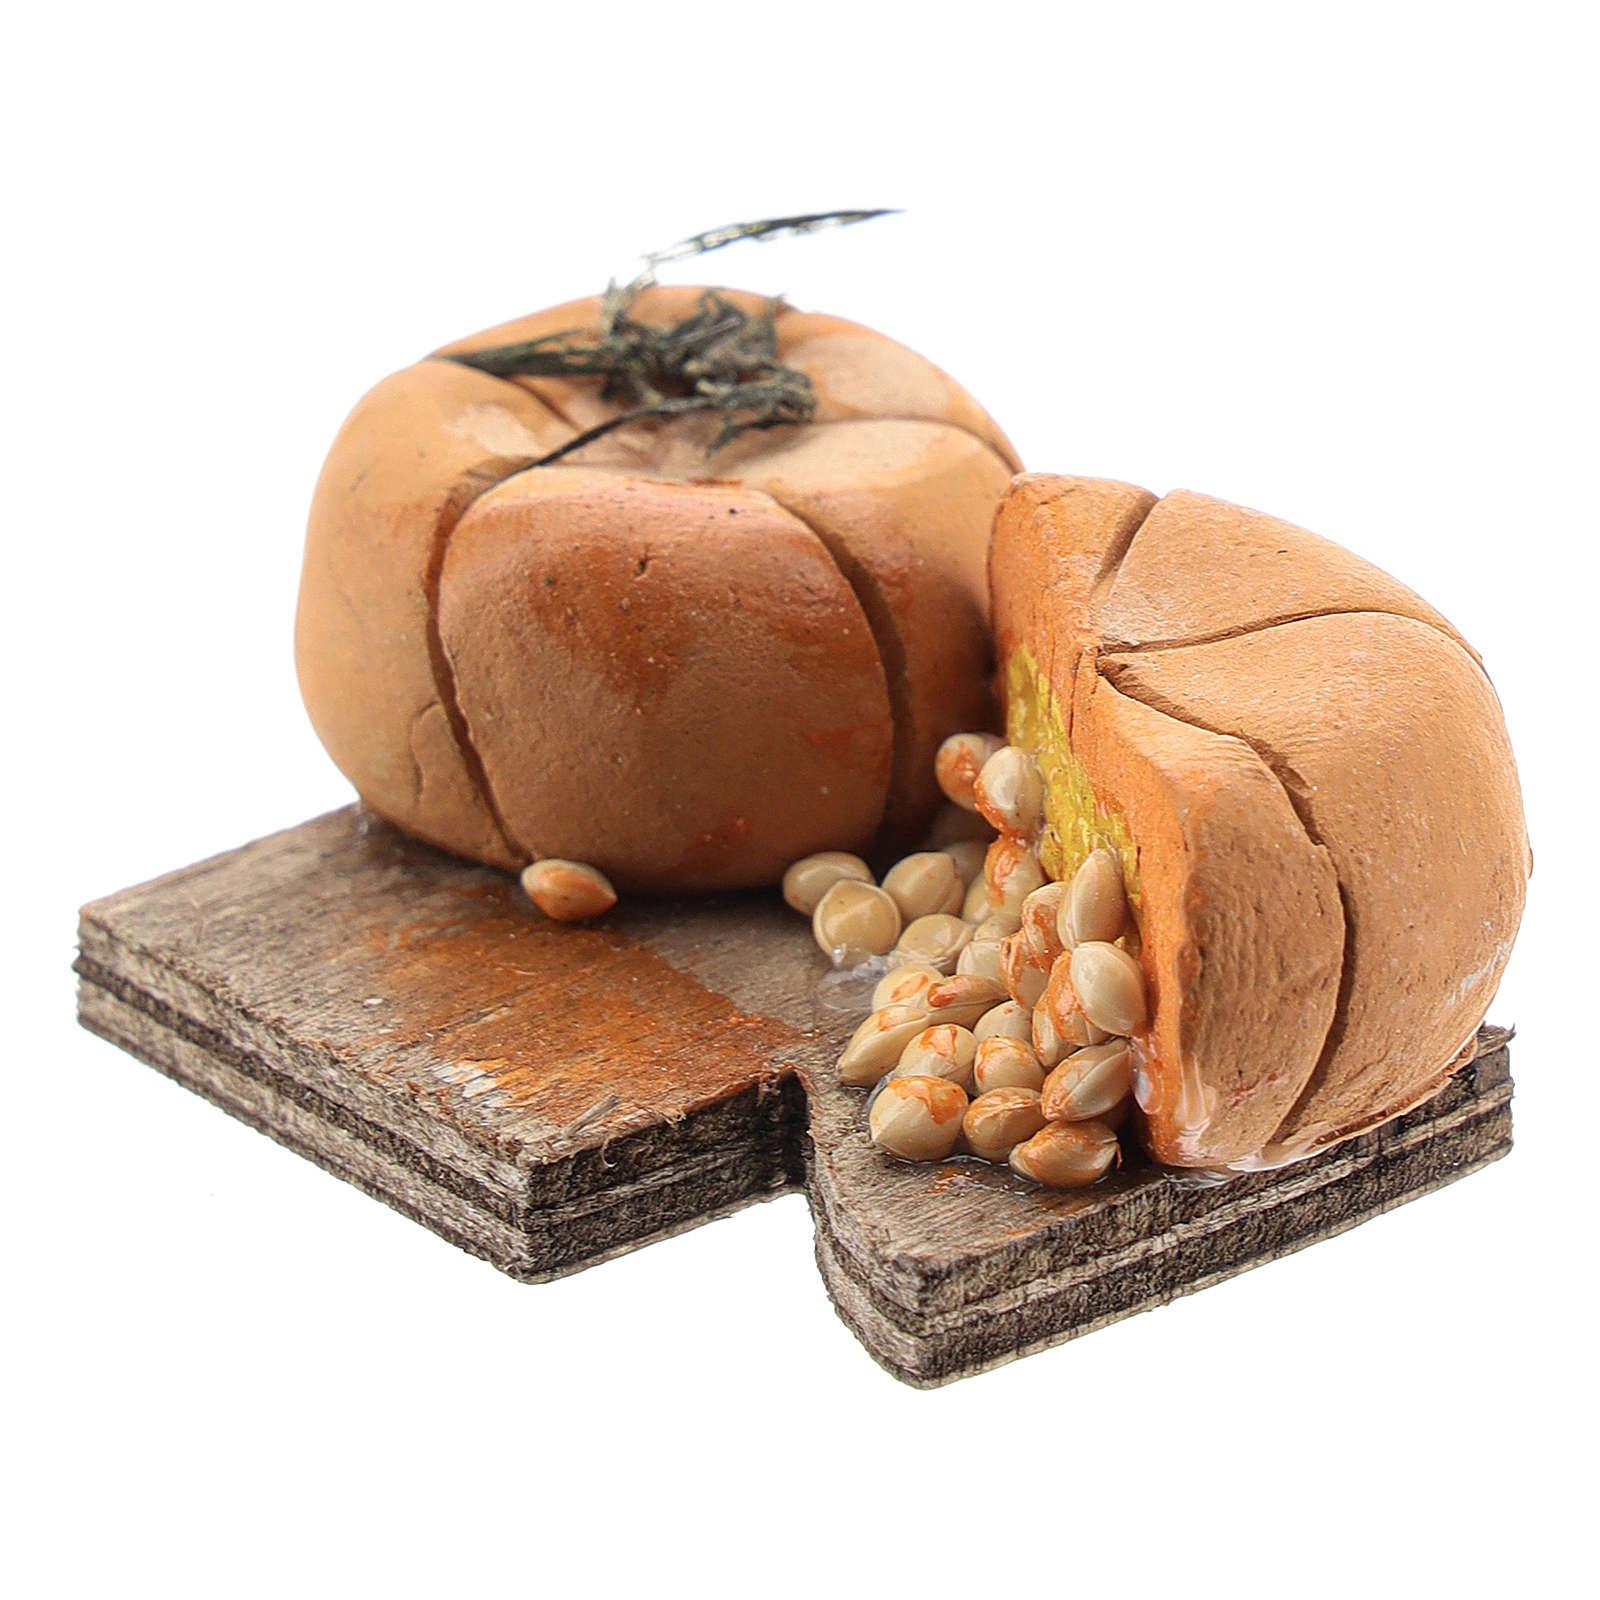 Chopping board with pumpkin for Neapolitan Nativity scene 12 cm 4